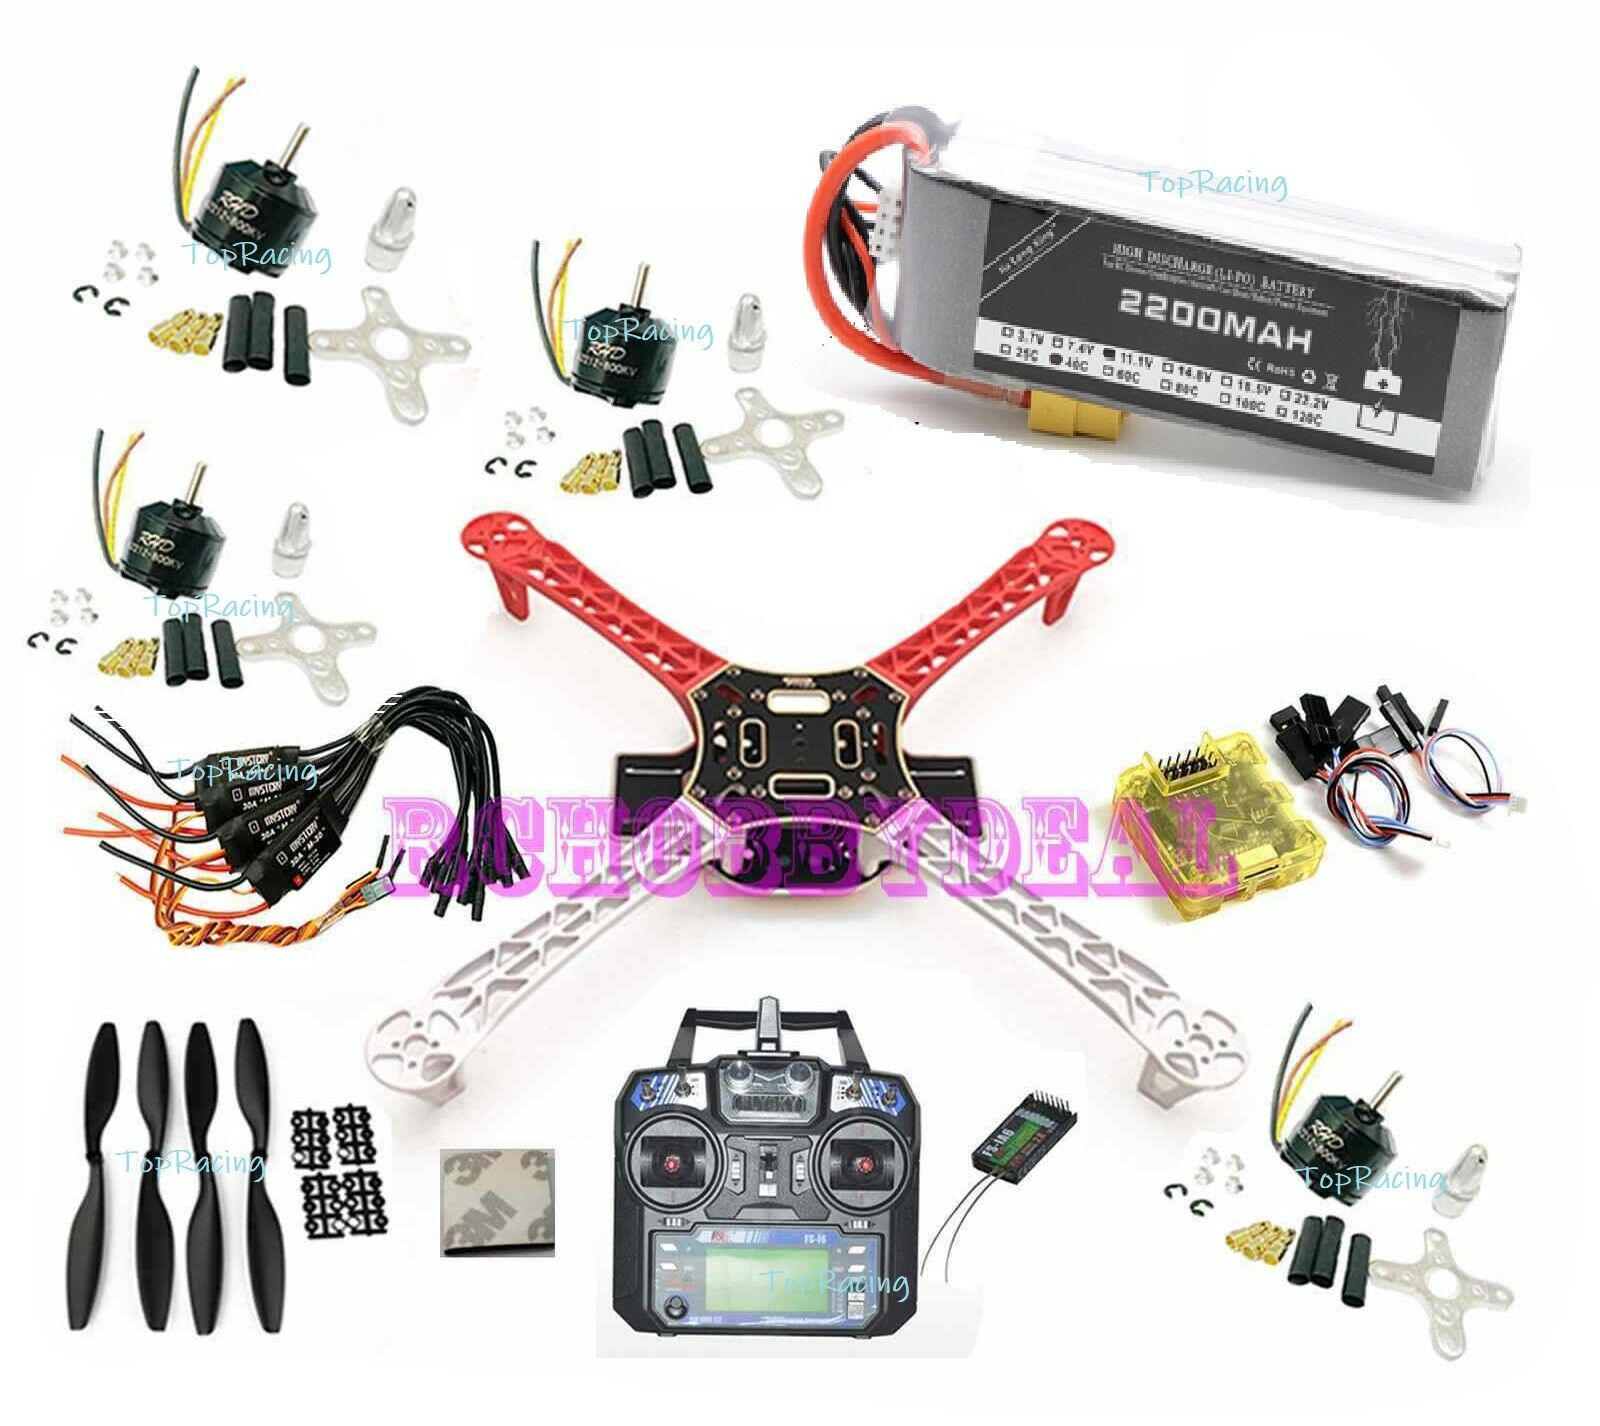 Kit para Armar uno mismo F450 Cuadricóptero RC Marco CC3D RHD Motor 30A ESC Prop i6 3s Batería Lipo